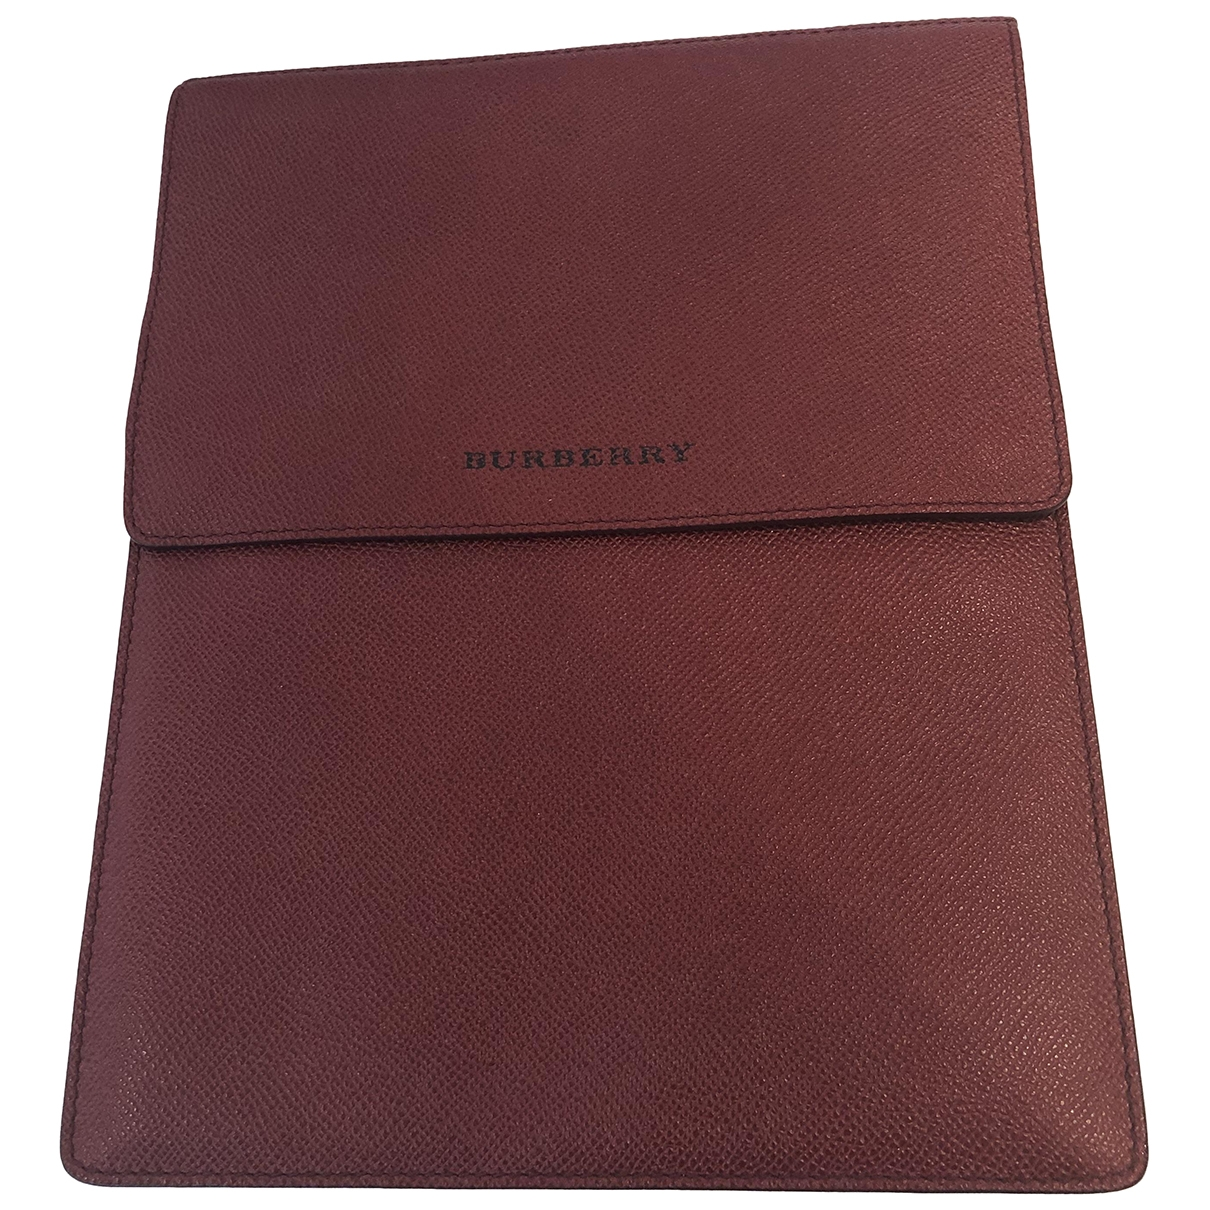 Burberry \N Accessoires in  Rot Leder